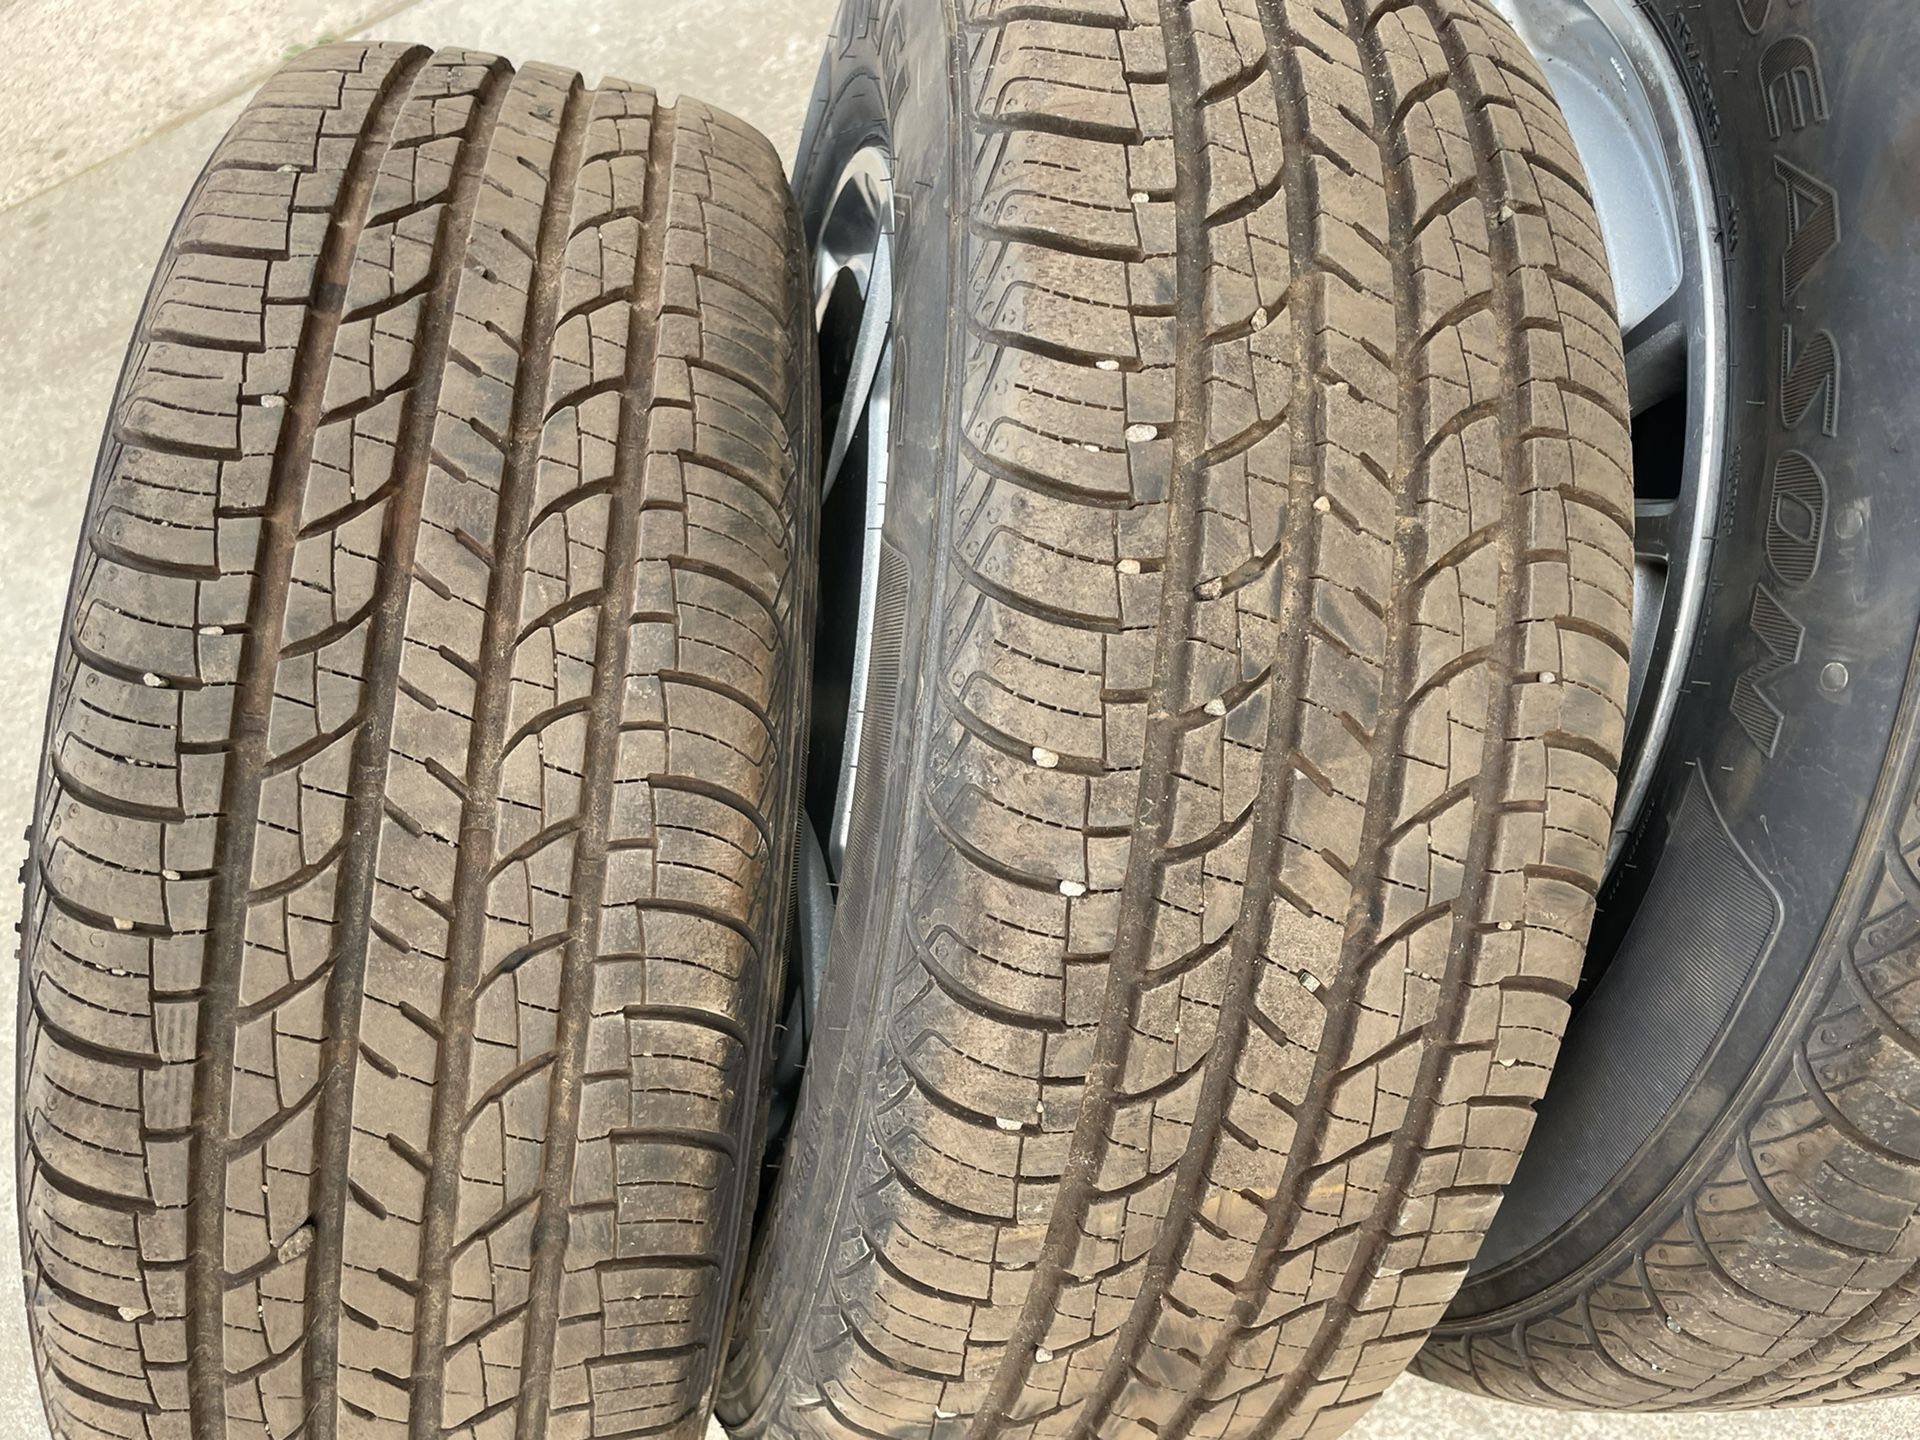 2006-2011 Honda Civic Enkei Wheels 195 65 15 Tires 90%